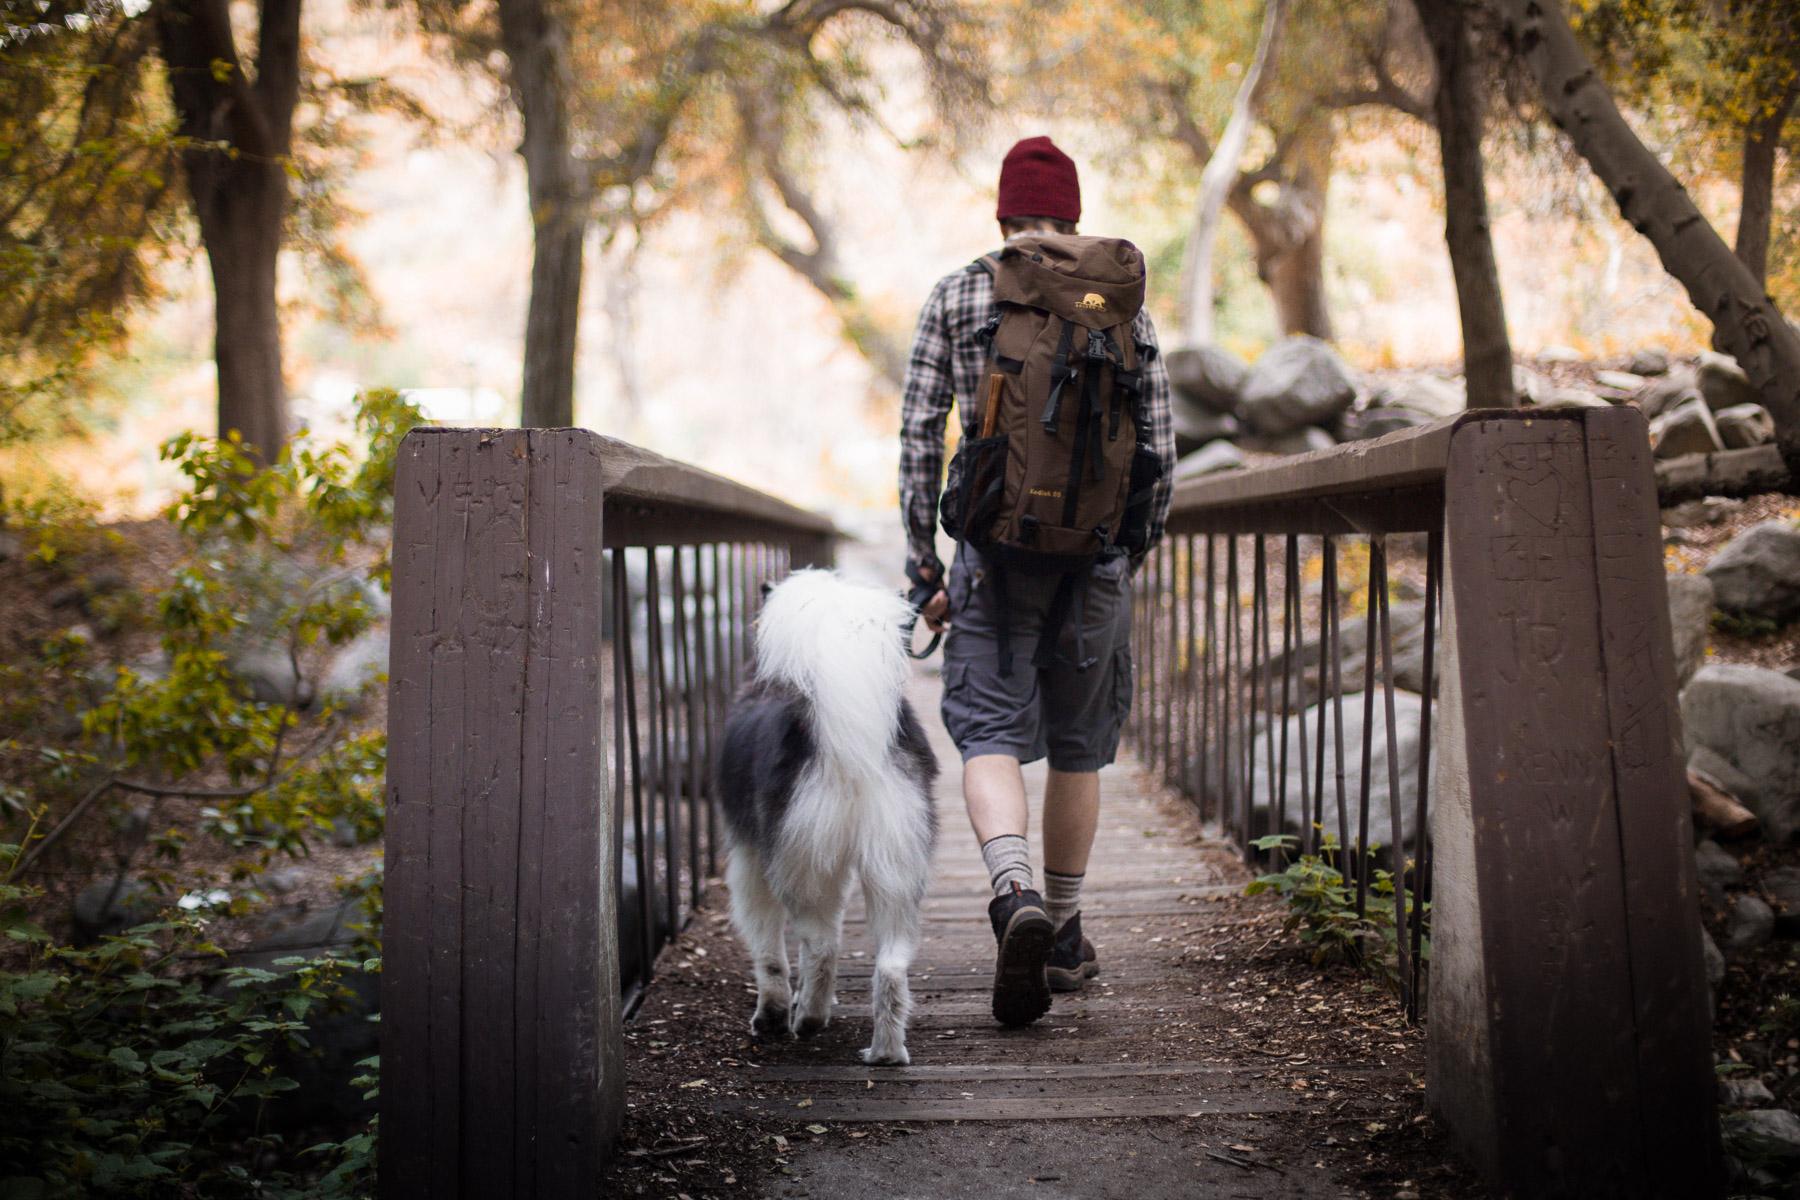 beautiful-photo-dog-owner-walking-sunset-bridge-hiking-adventures-dog-photographer.jpg